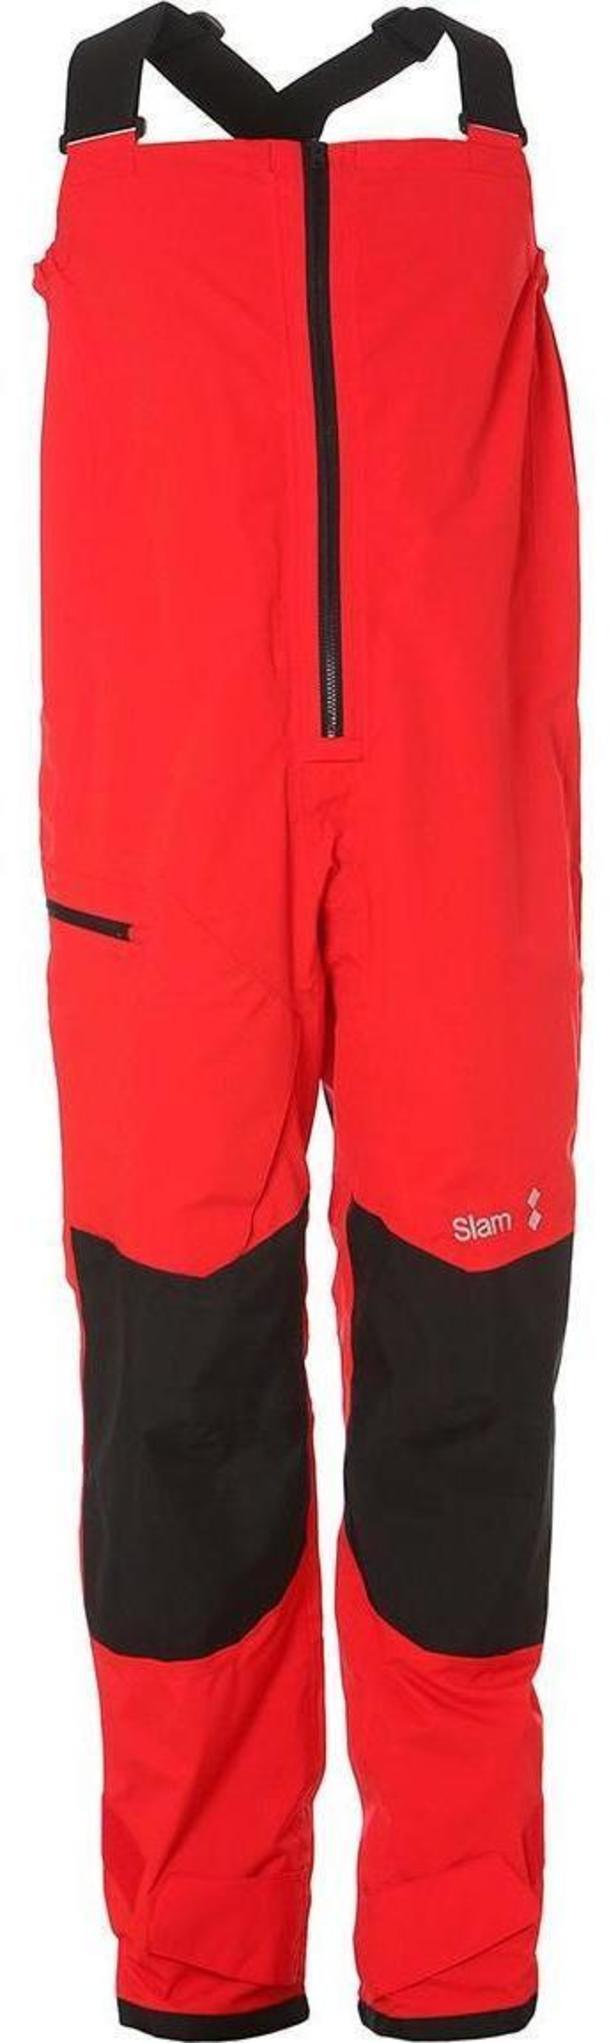 Комбинезон Slam Win-D 1 Sailing Bibs, red, XL